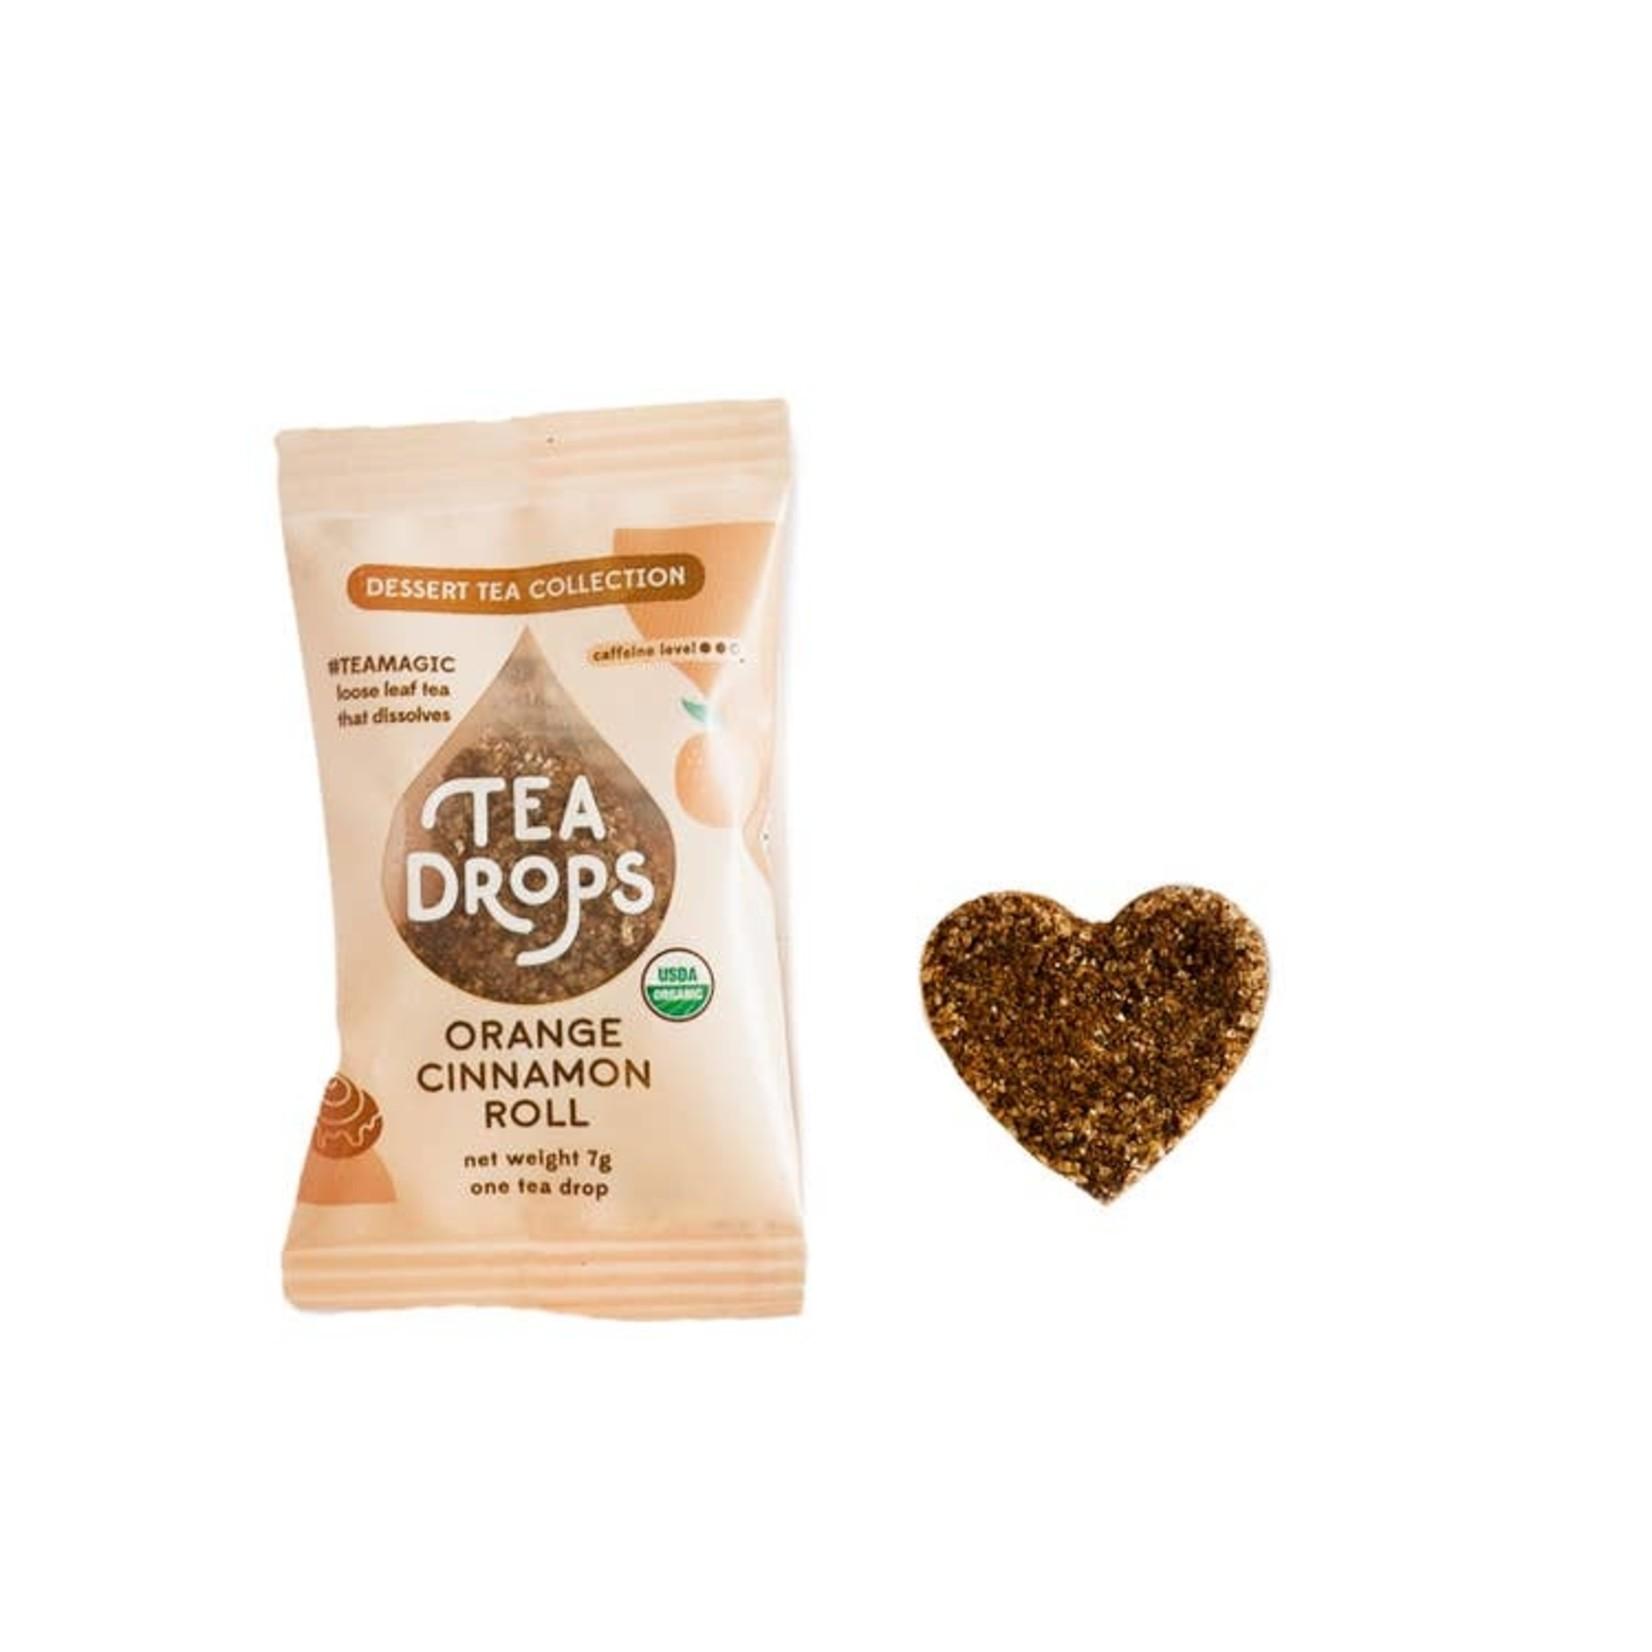 Tea Drops Orange Cinnamon Roll Single Serving